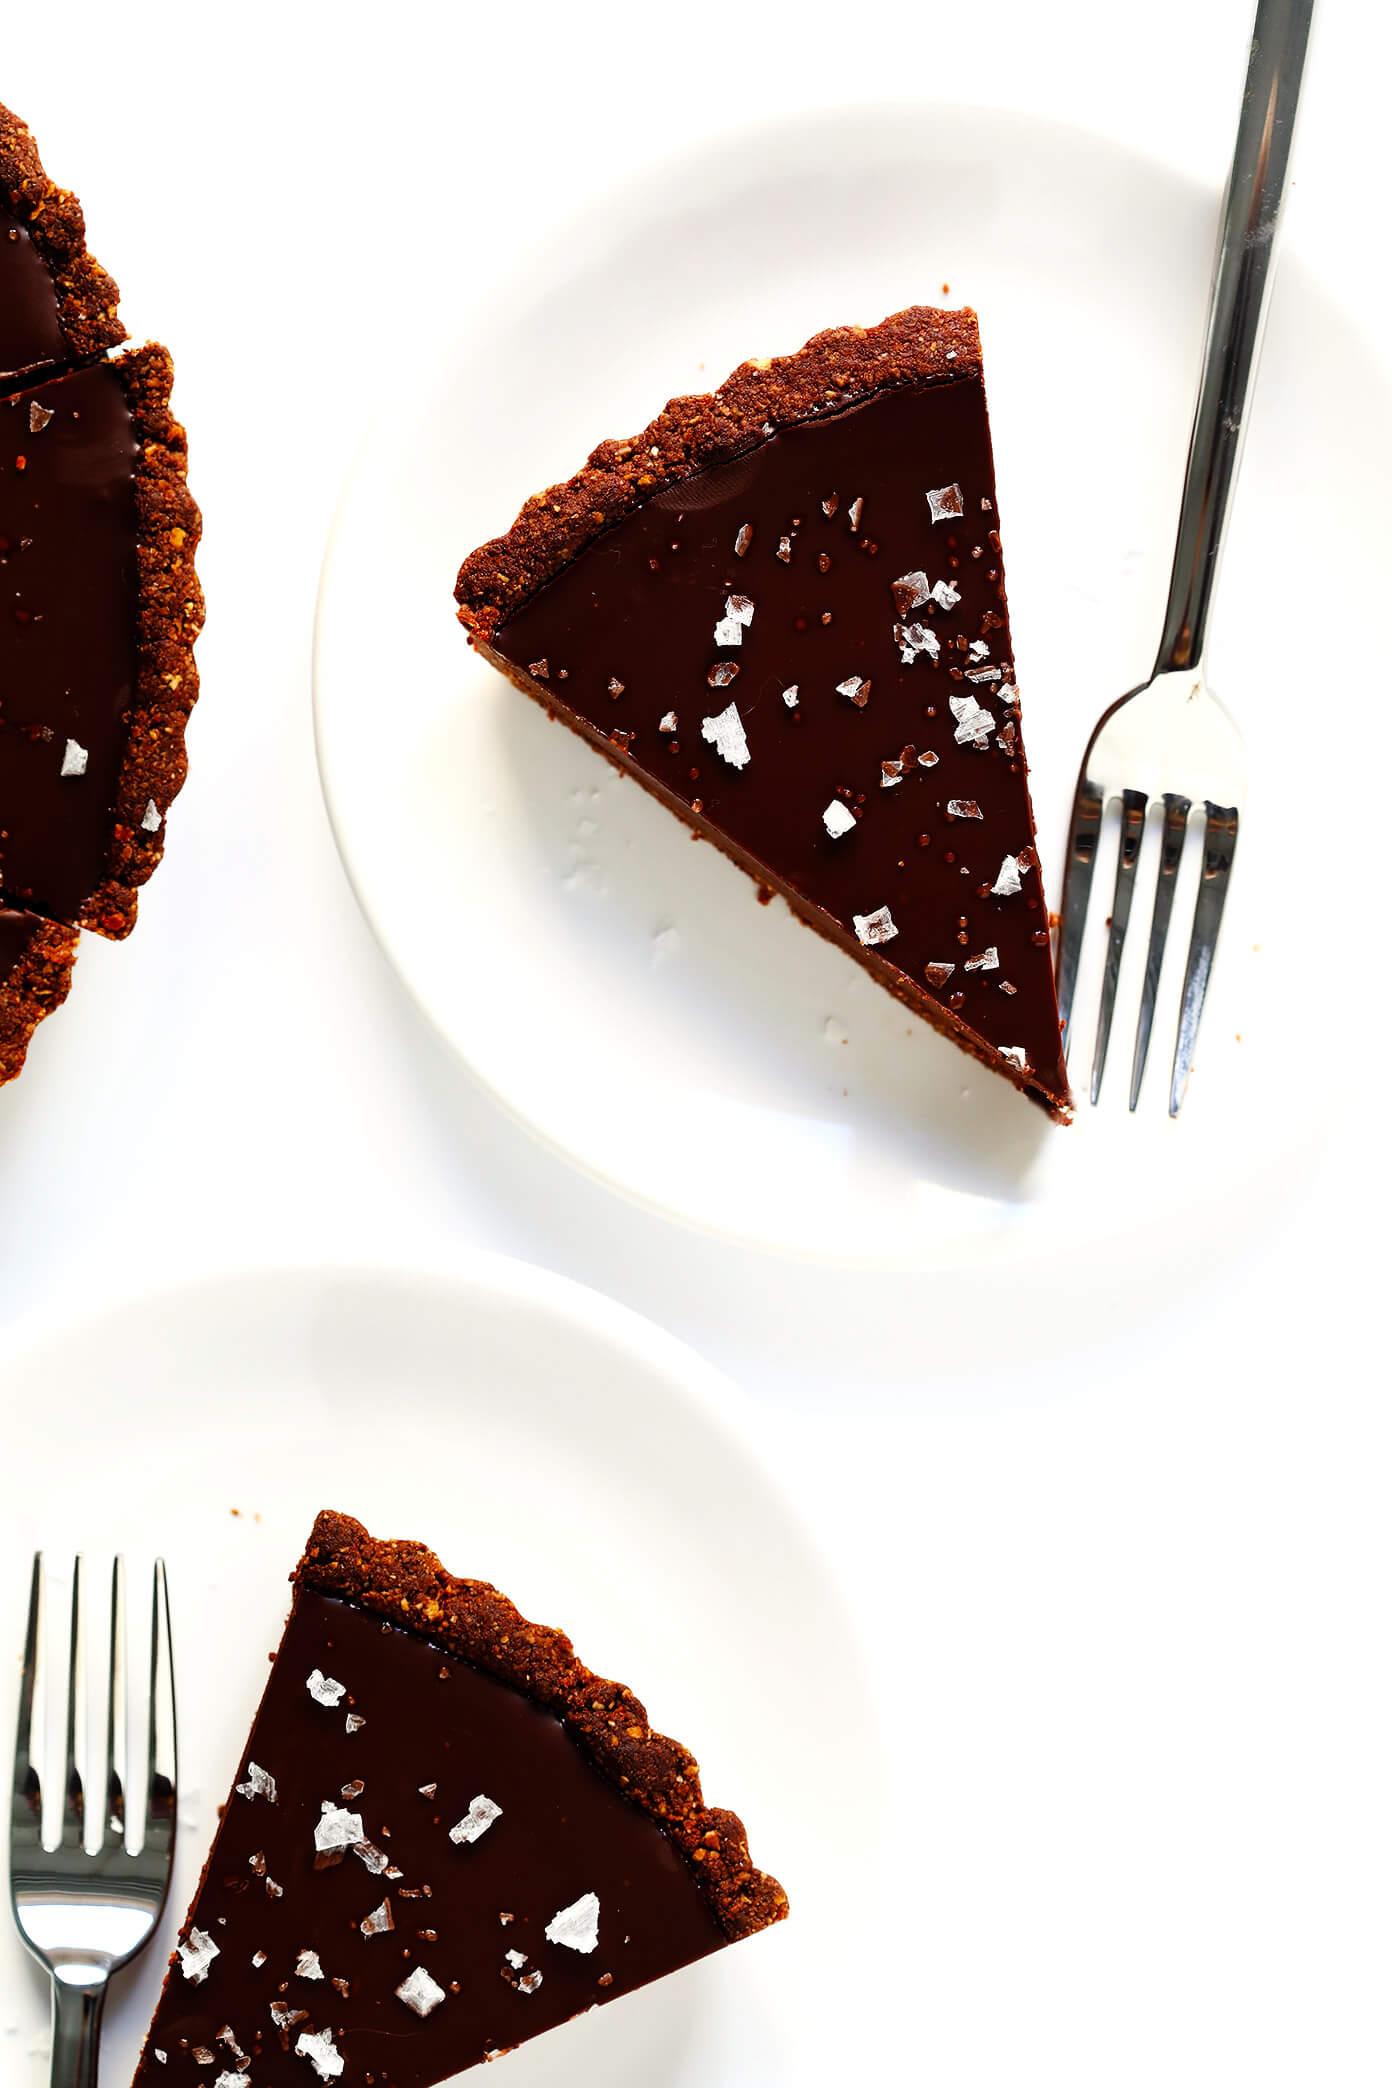 Salted Dark Chocolate Tart Slices